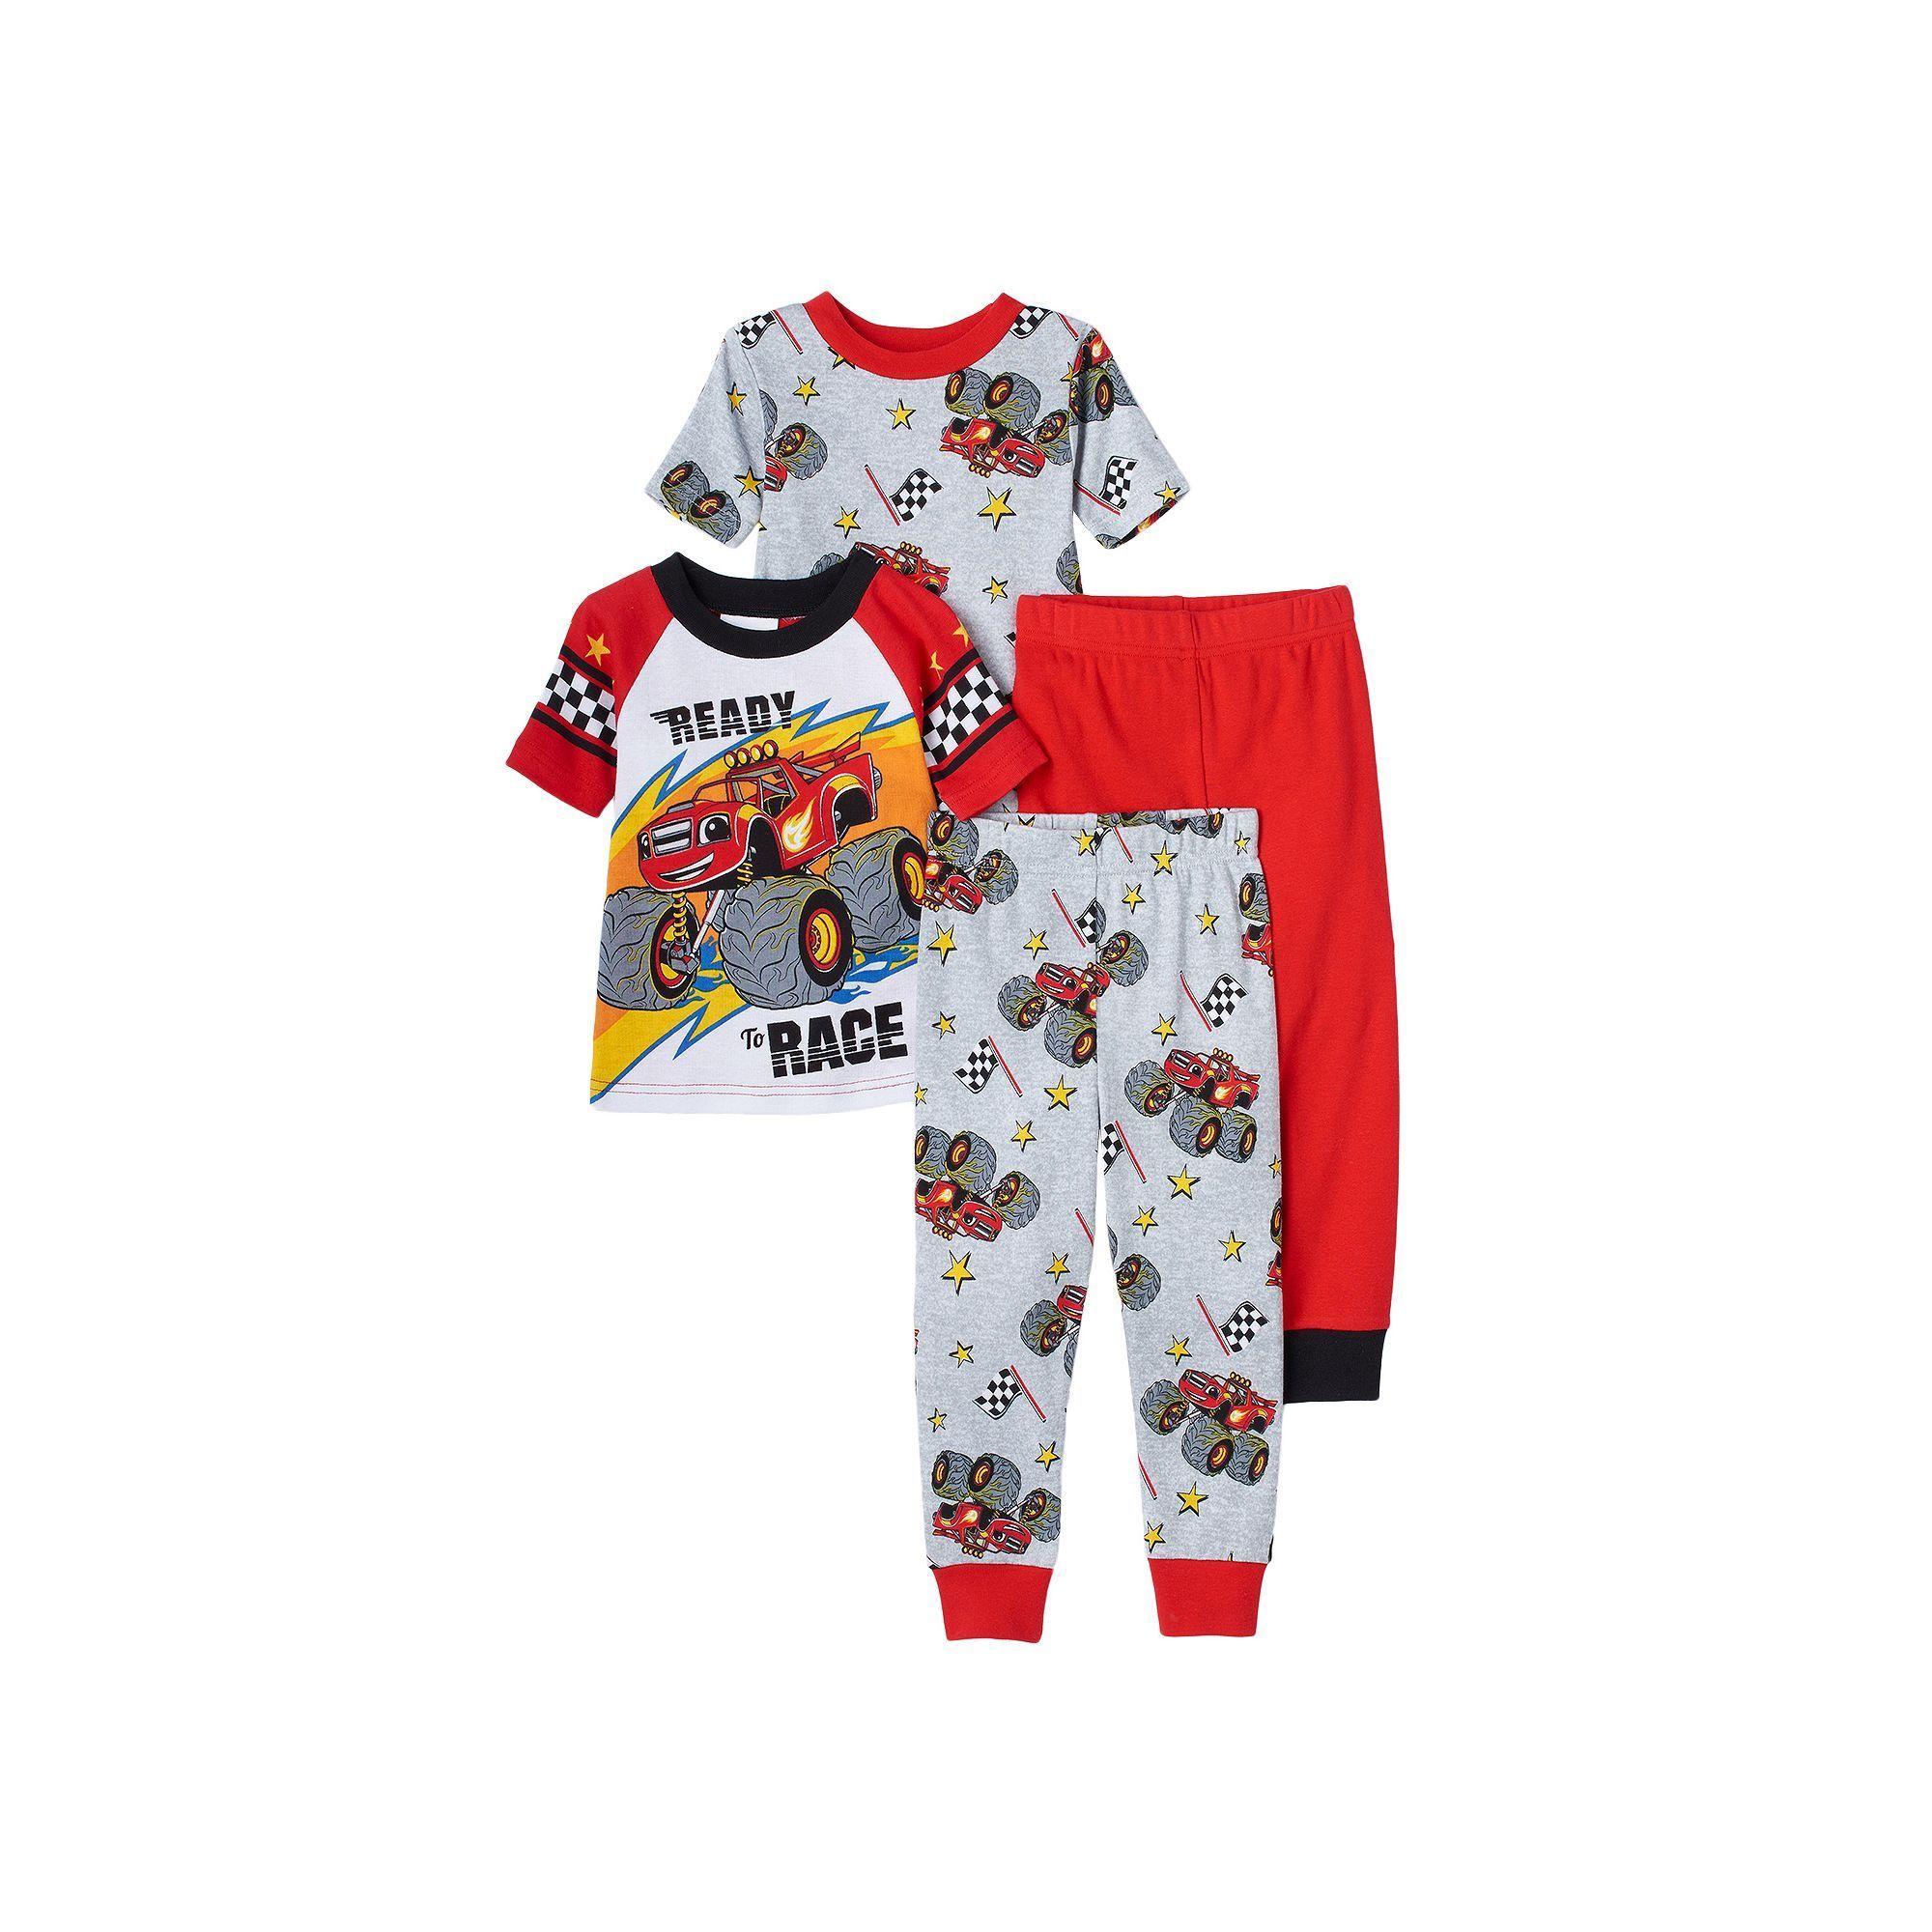 Paw Patrol Toddler Boys 4 Pc Snug Fit Christmas Pajama Set NWT Size 3T  Colorful